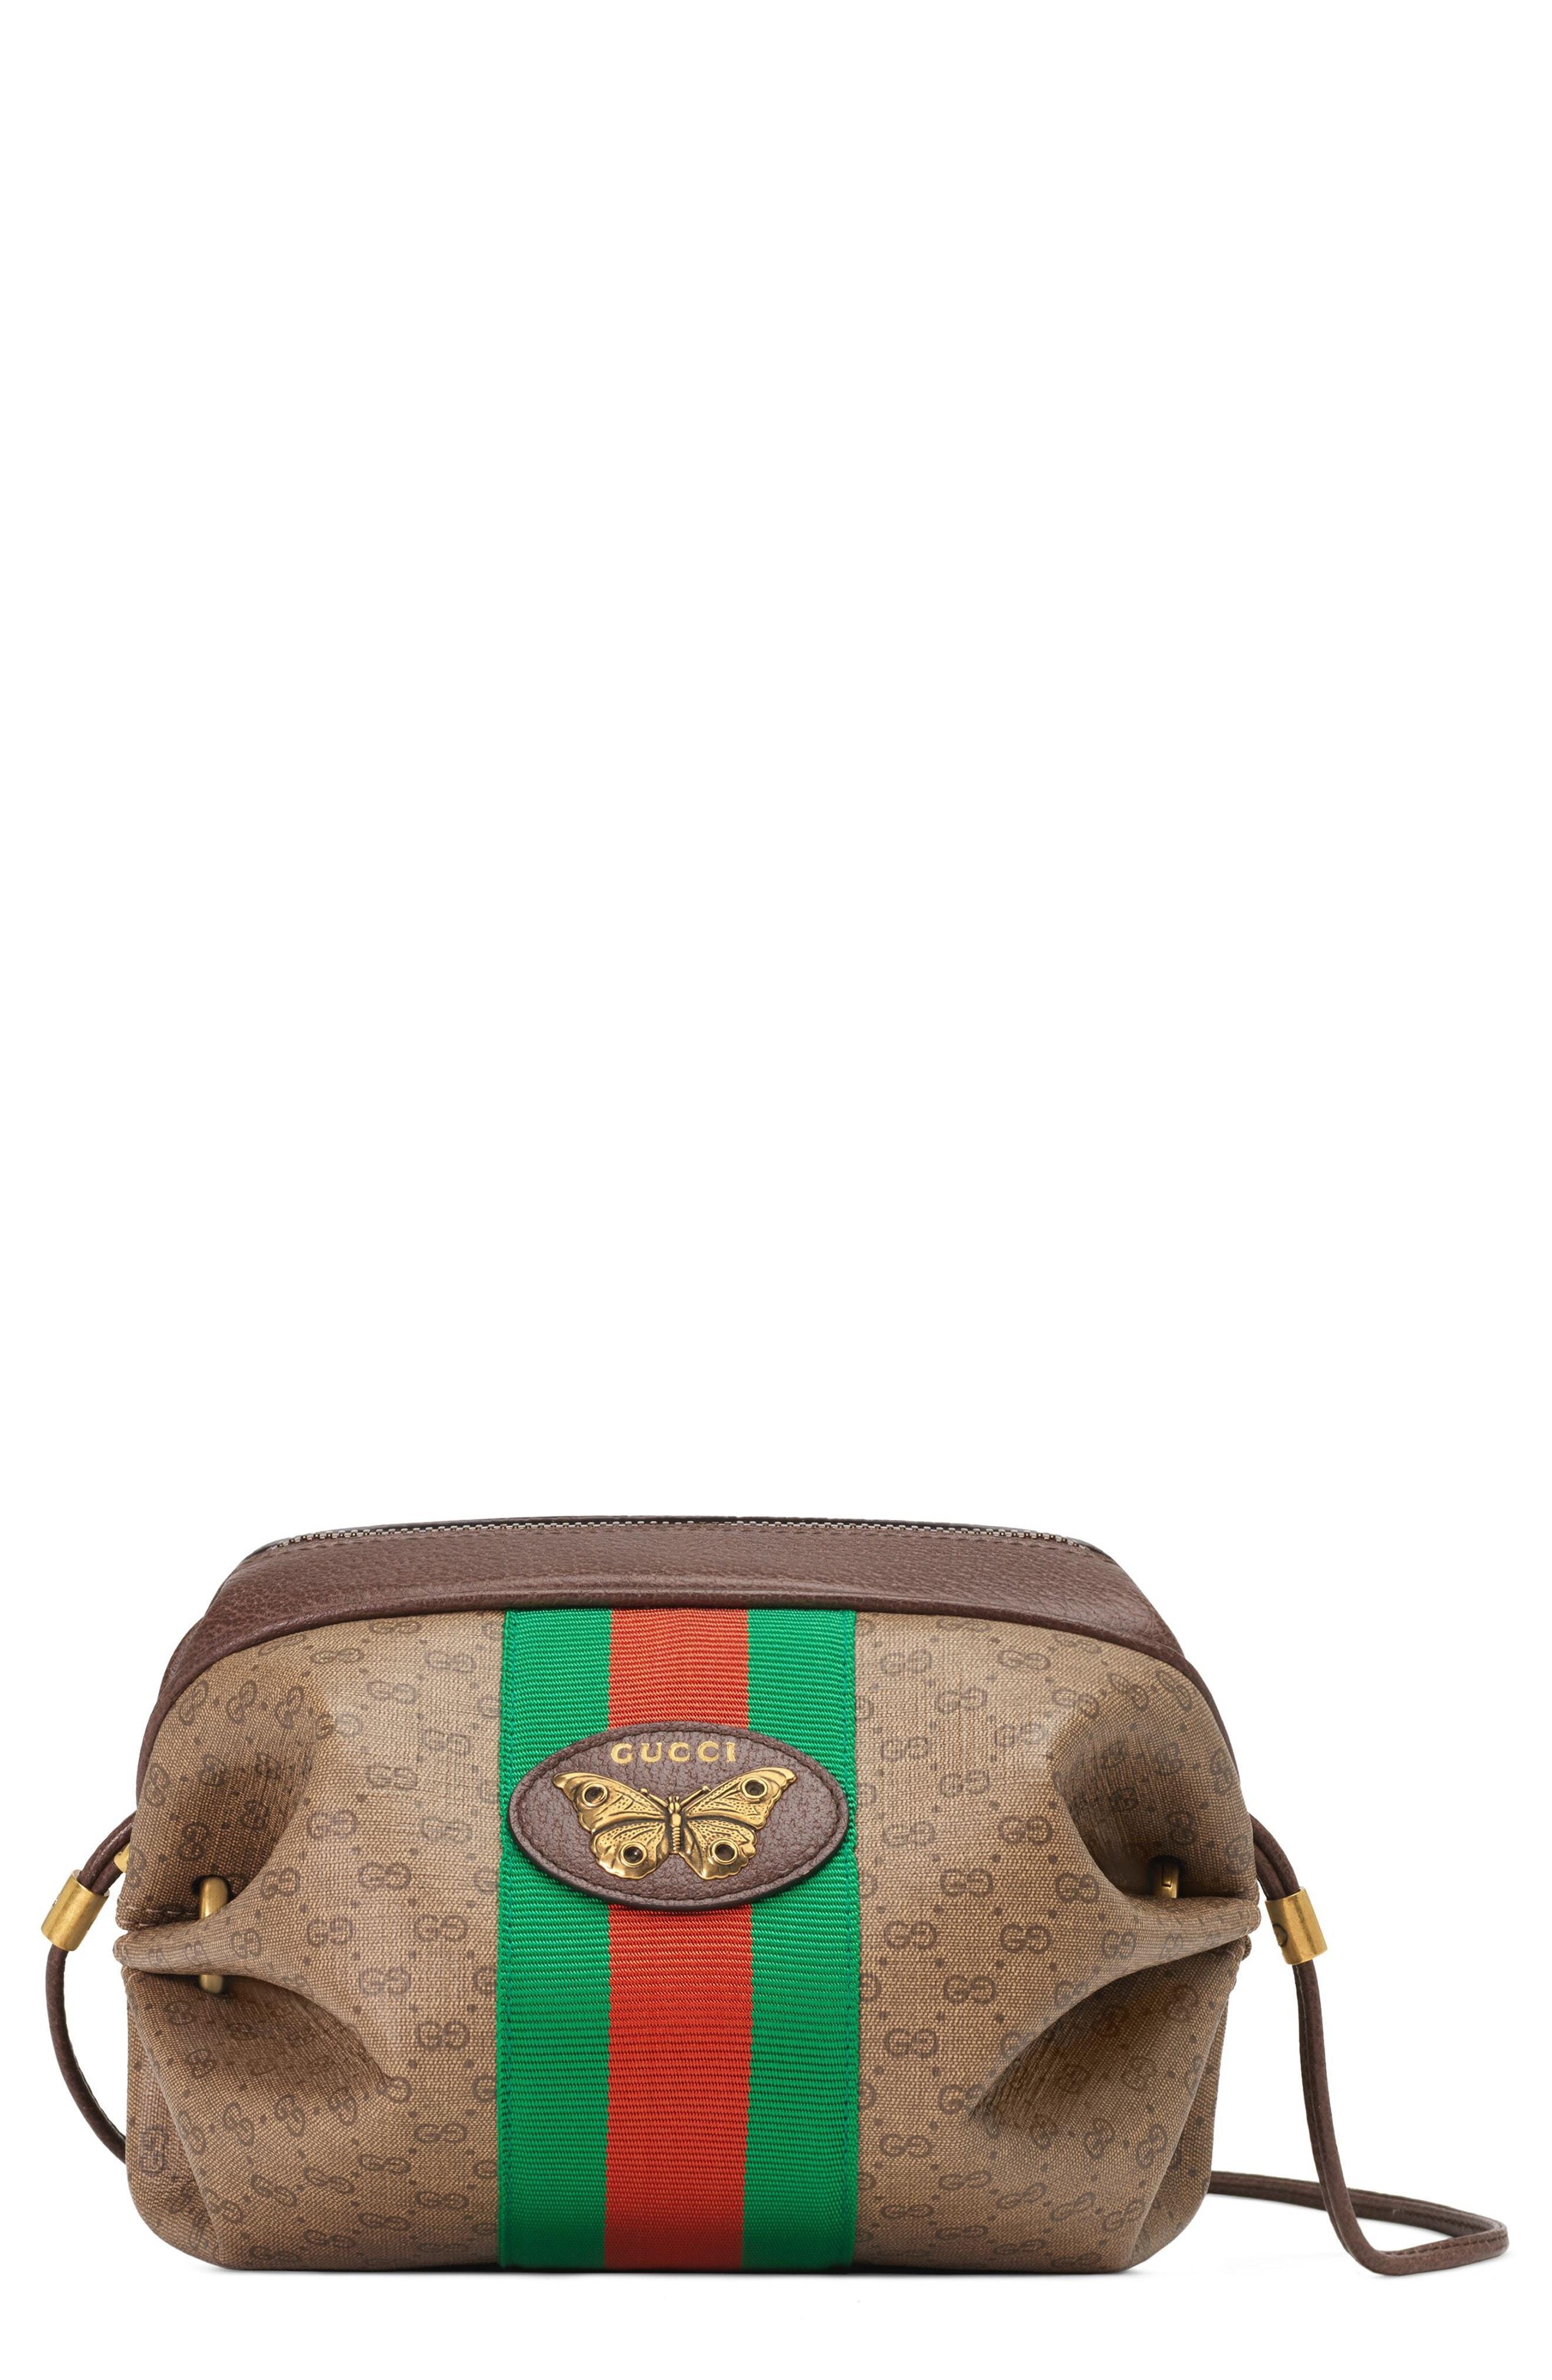 6622afda85821 Gucci - Natural New Candy Gg Supreme Canvas Mini Crossbody Bag - Lyst. View  fullscreen